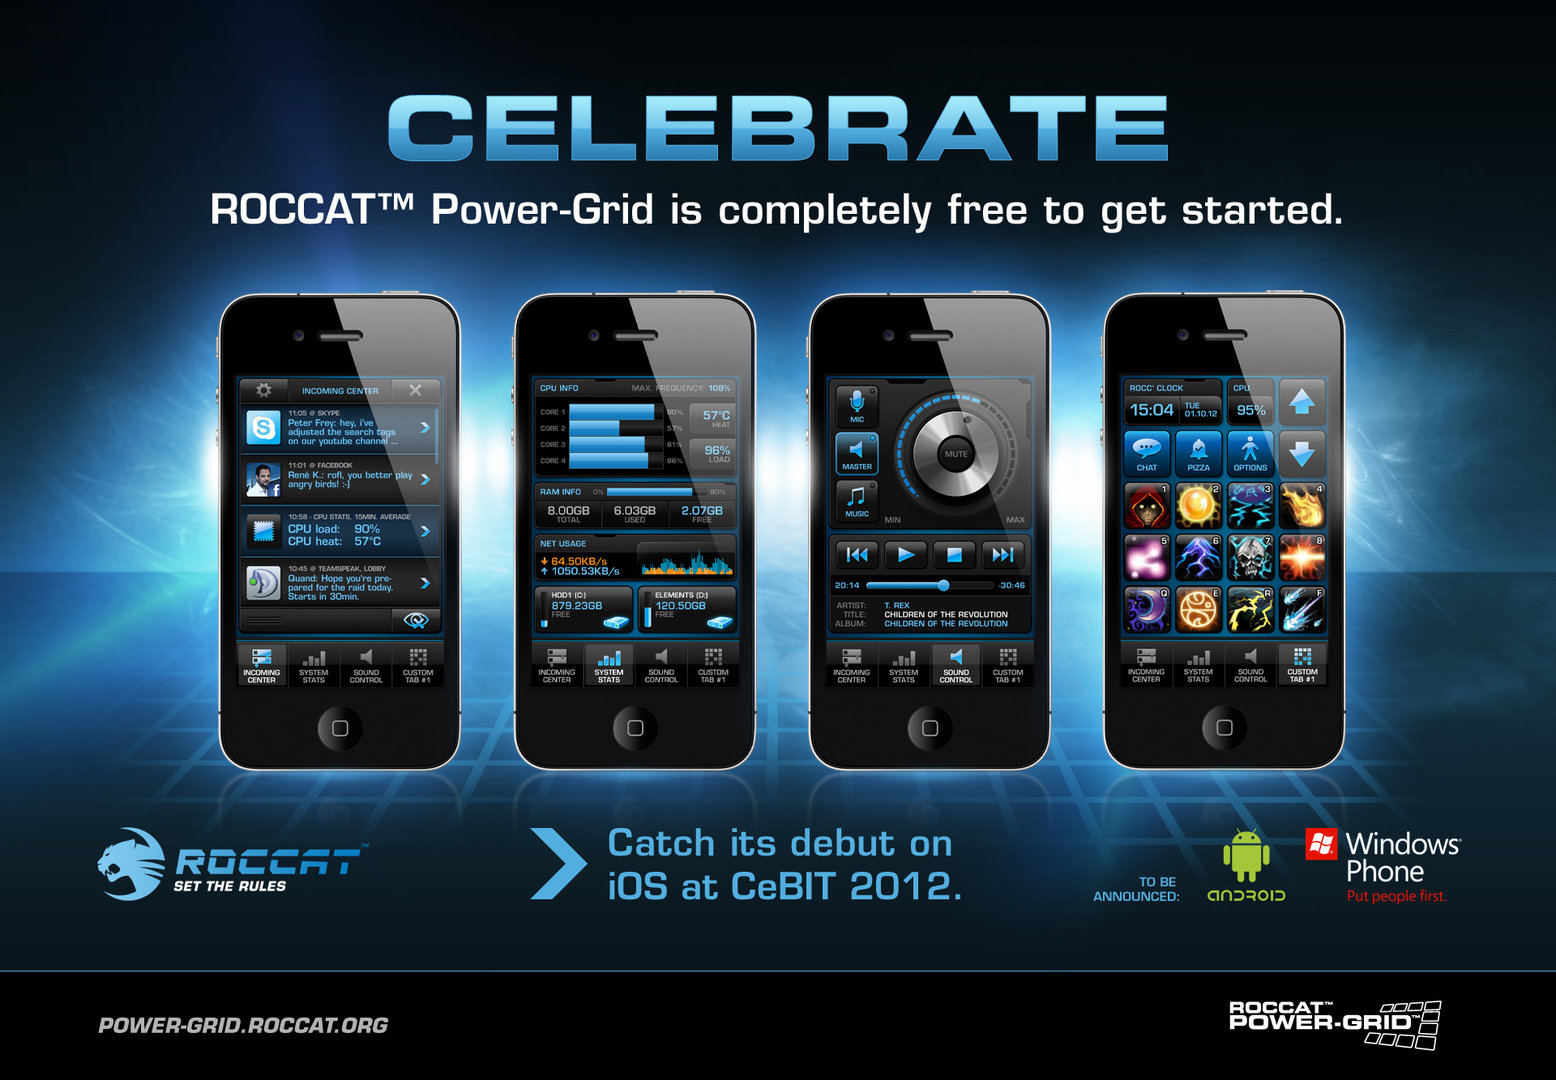 Roccat Power-Grid